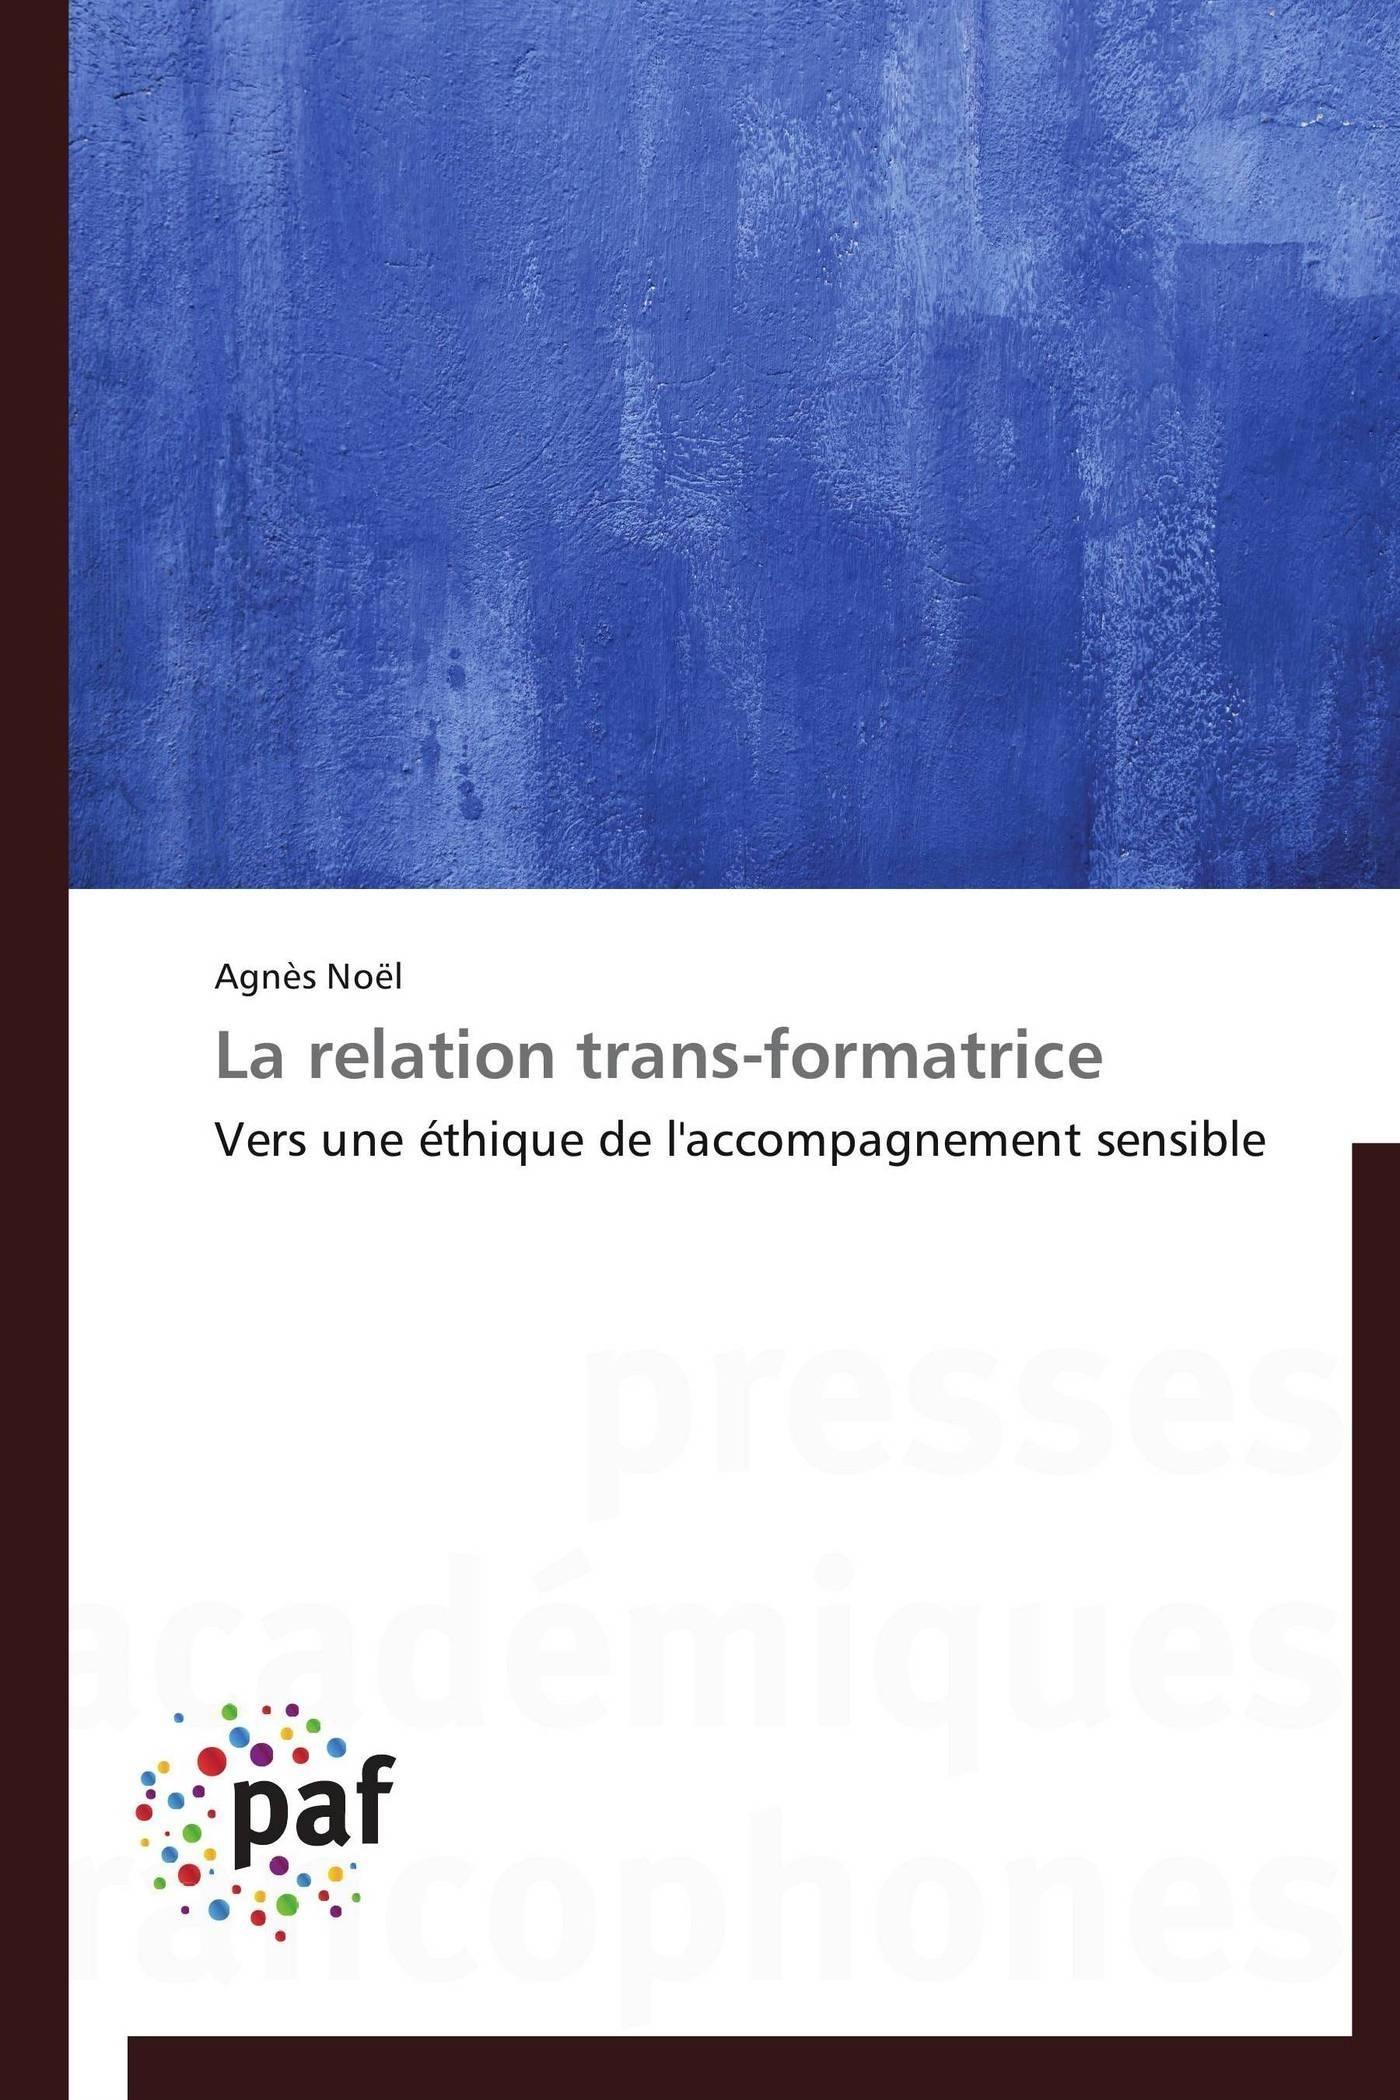 LA RELATION TRANS-FORMATRICE